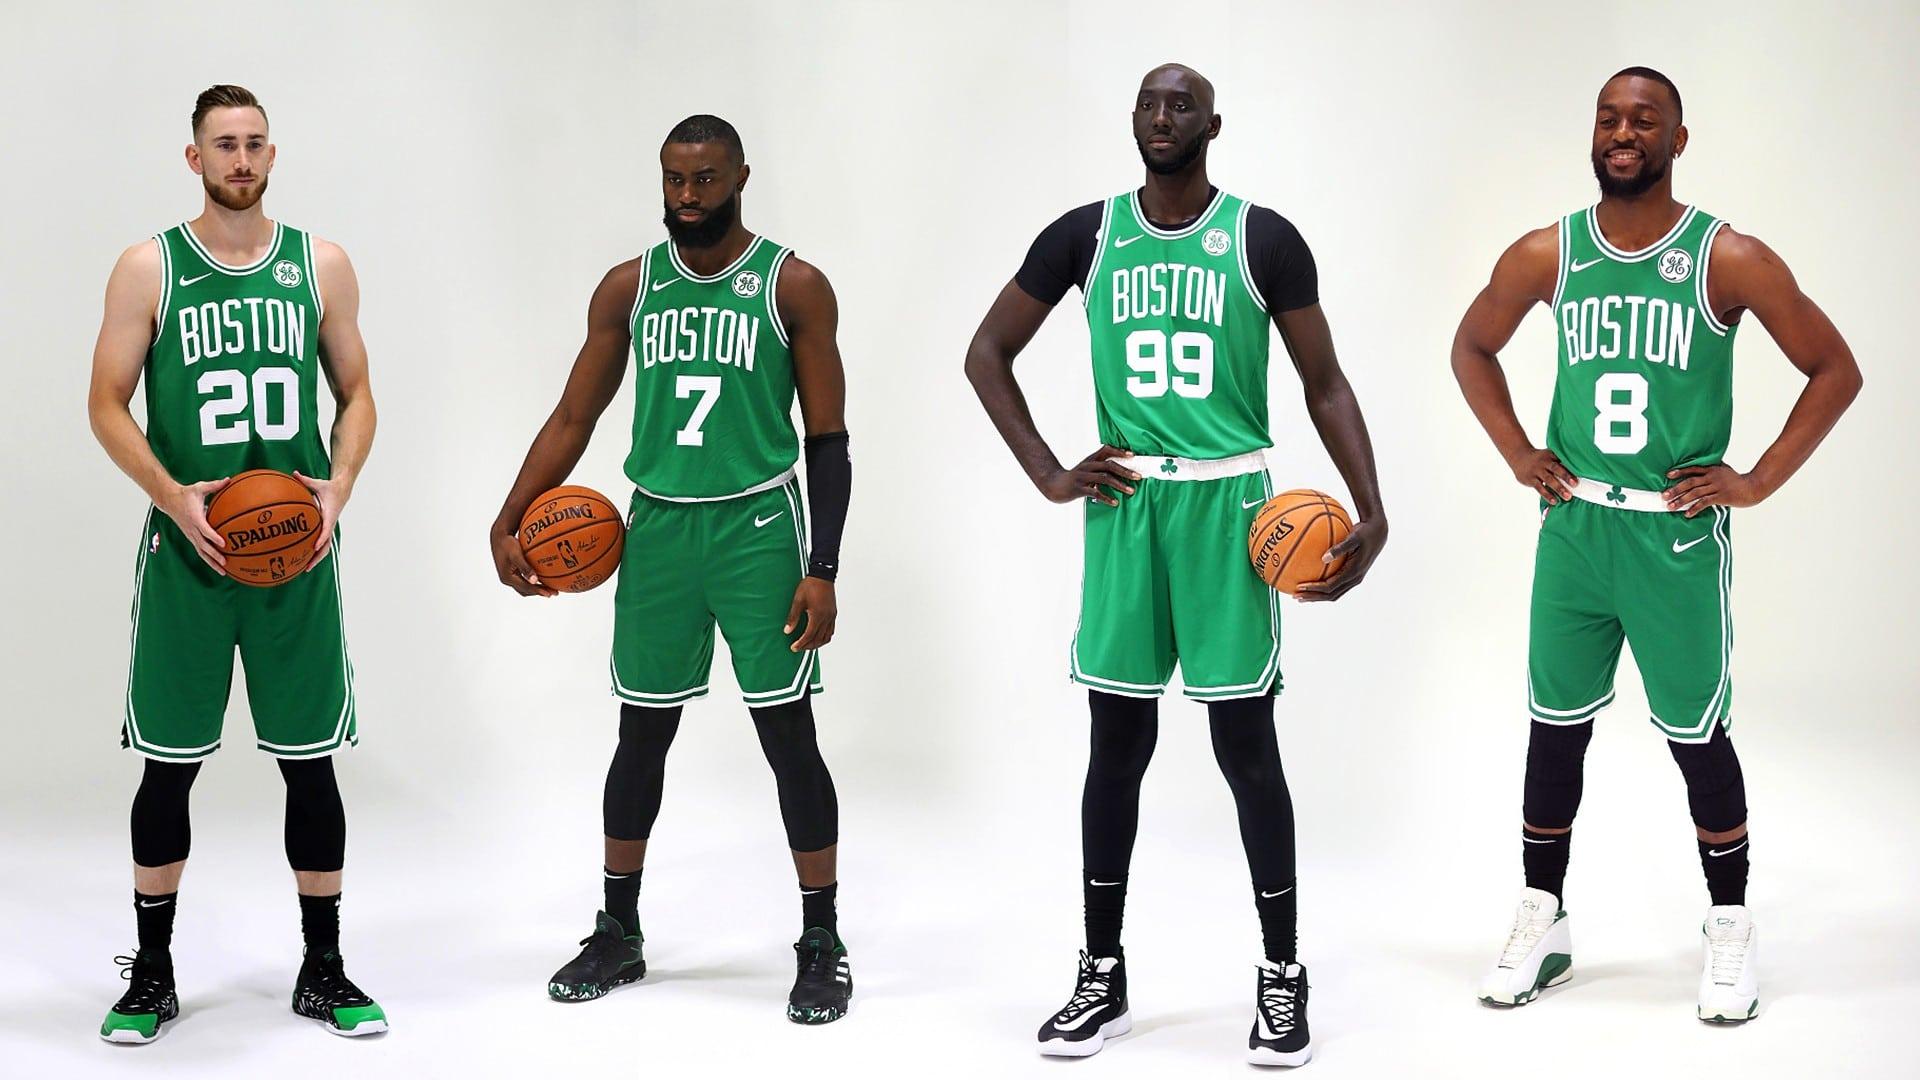 Camisa do Boston Celtics 2019/2020